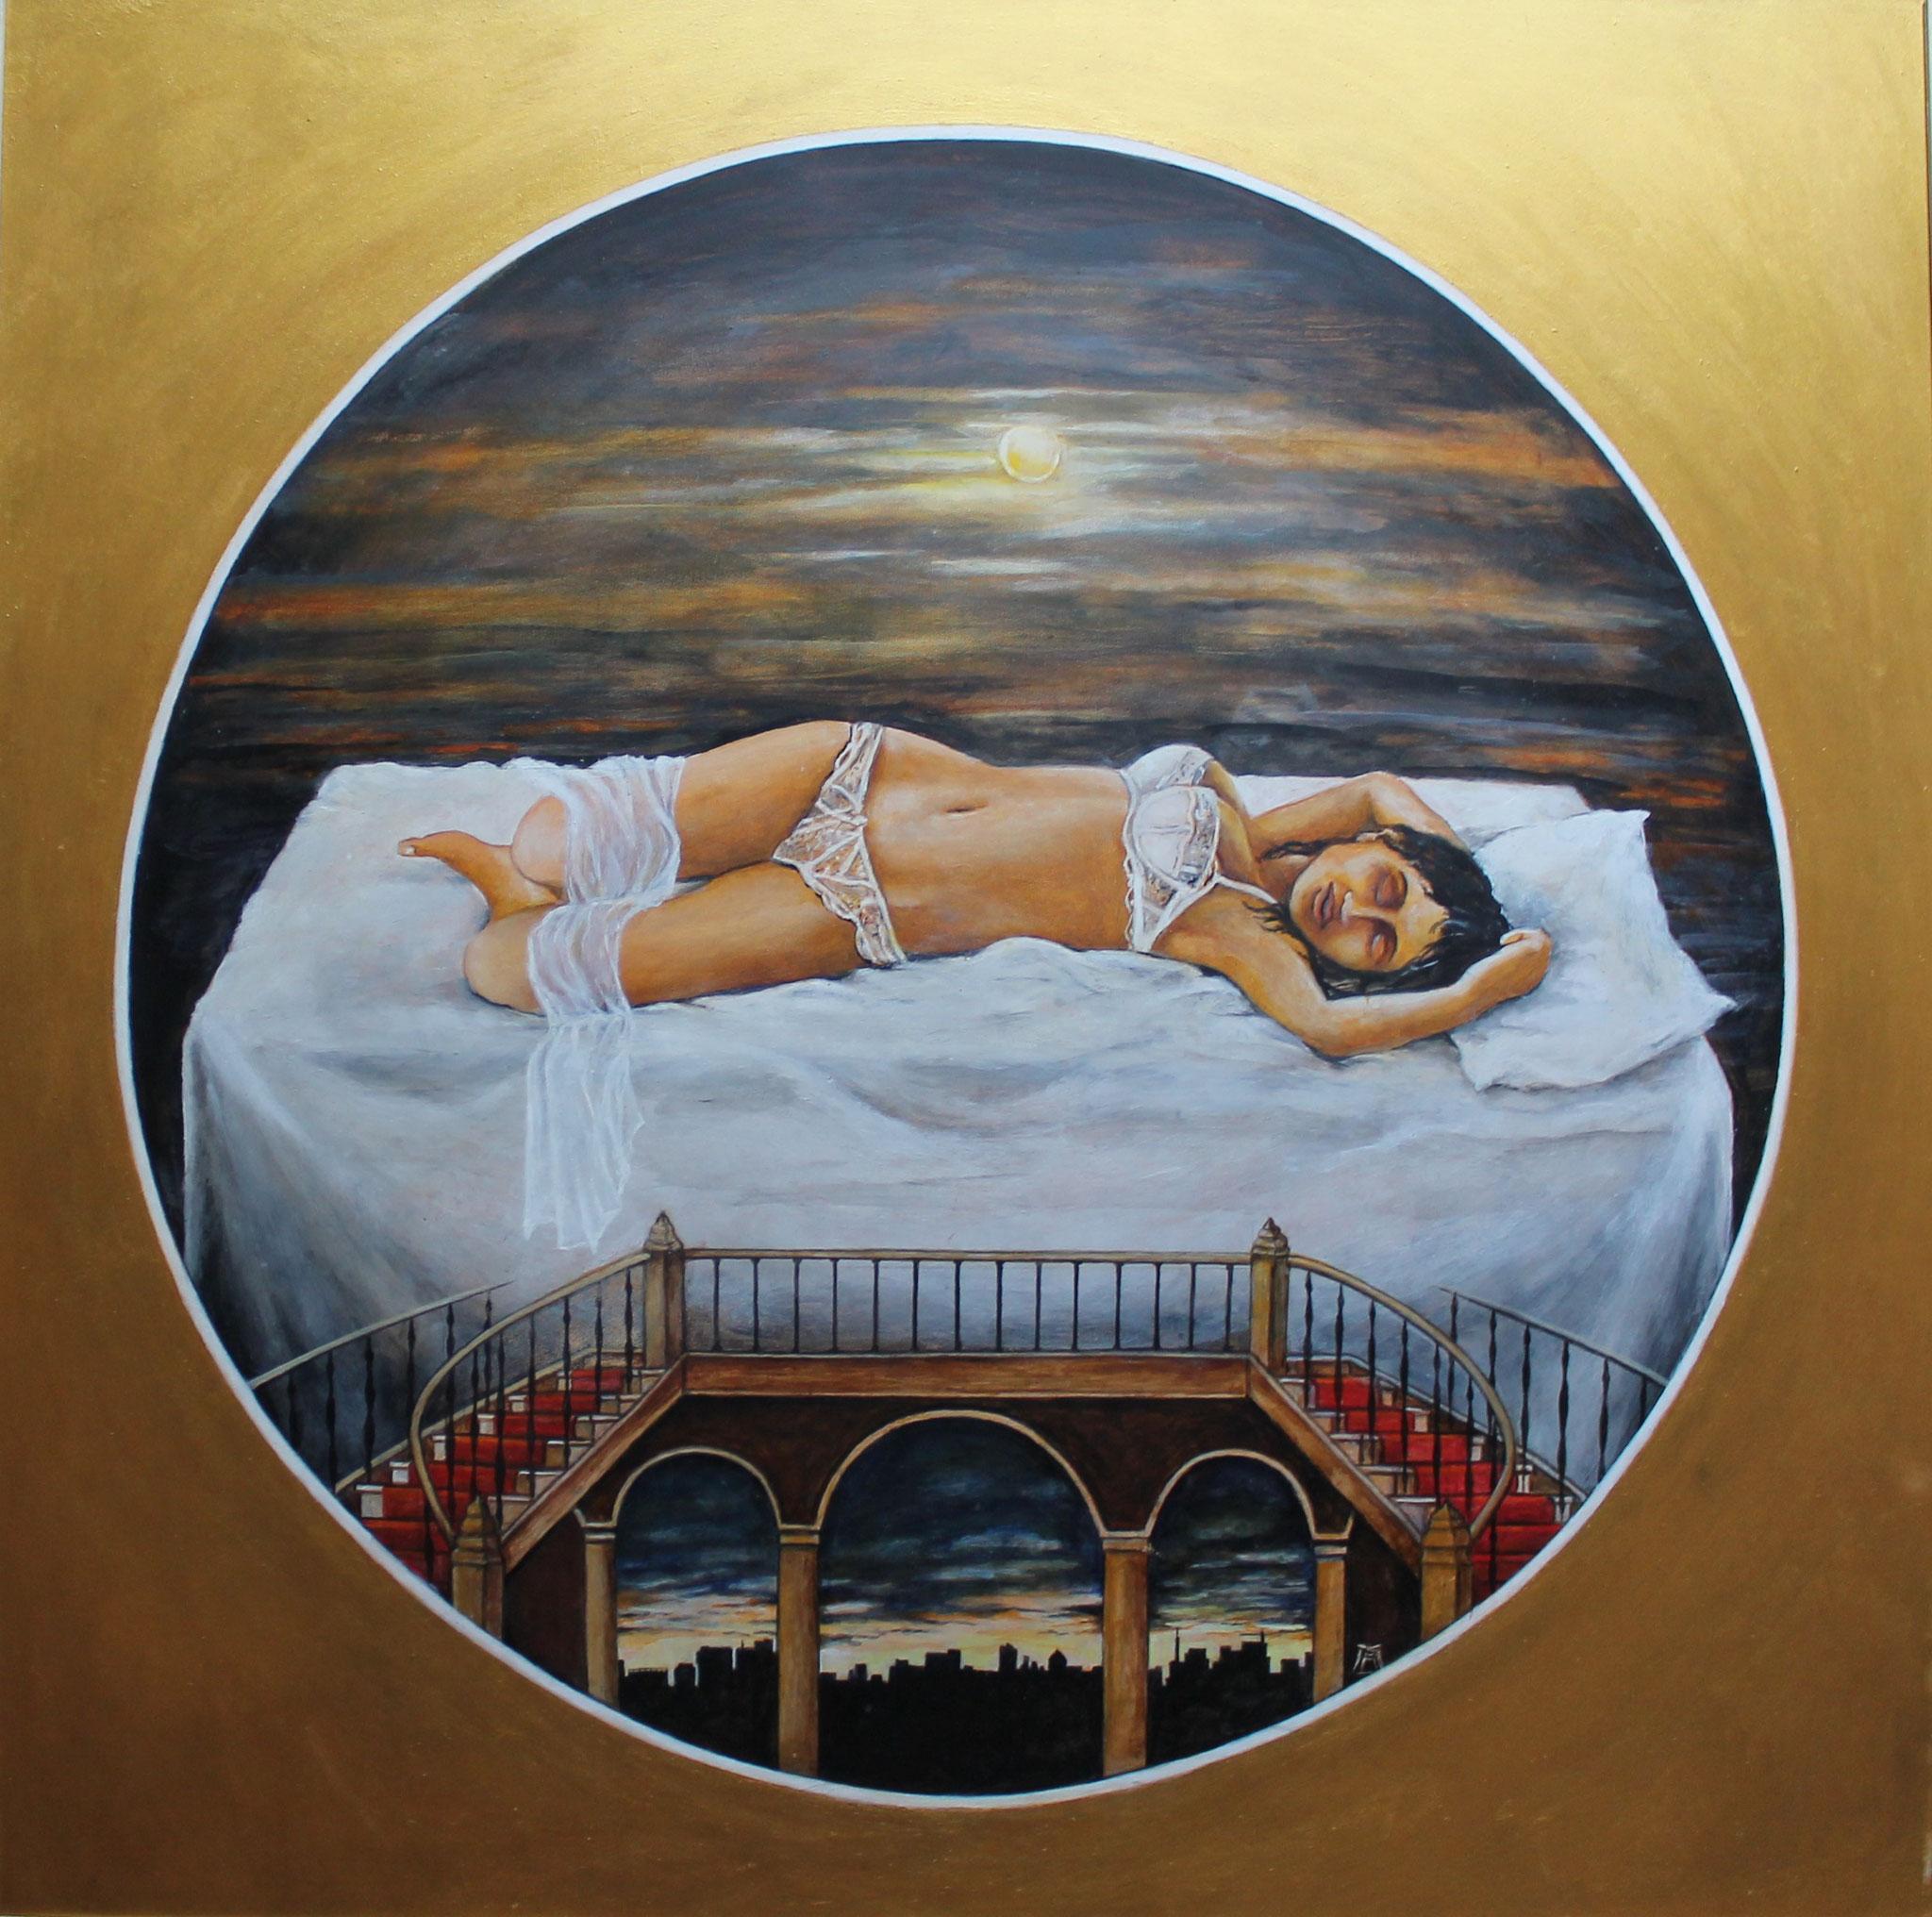 Stairway to Heaven, Acryl/Öl, 60 x 60 cm, 2016